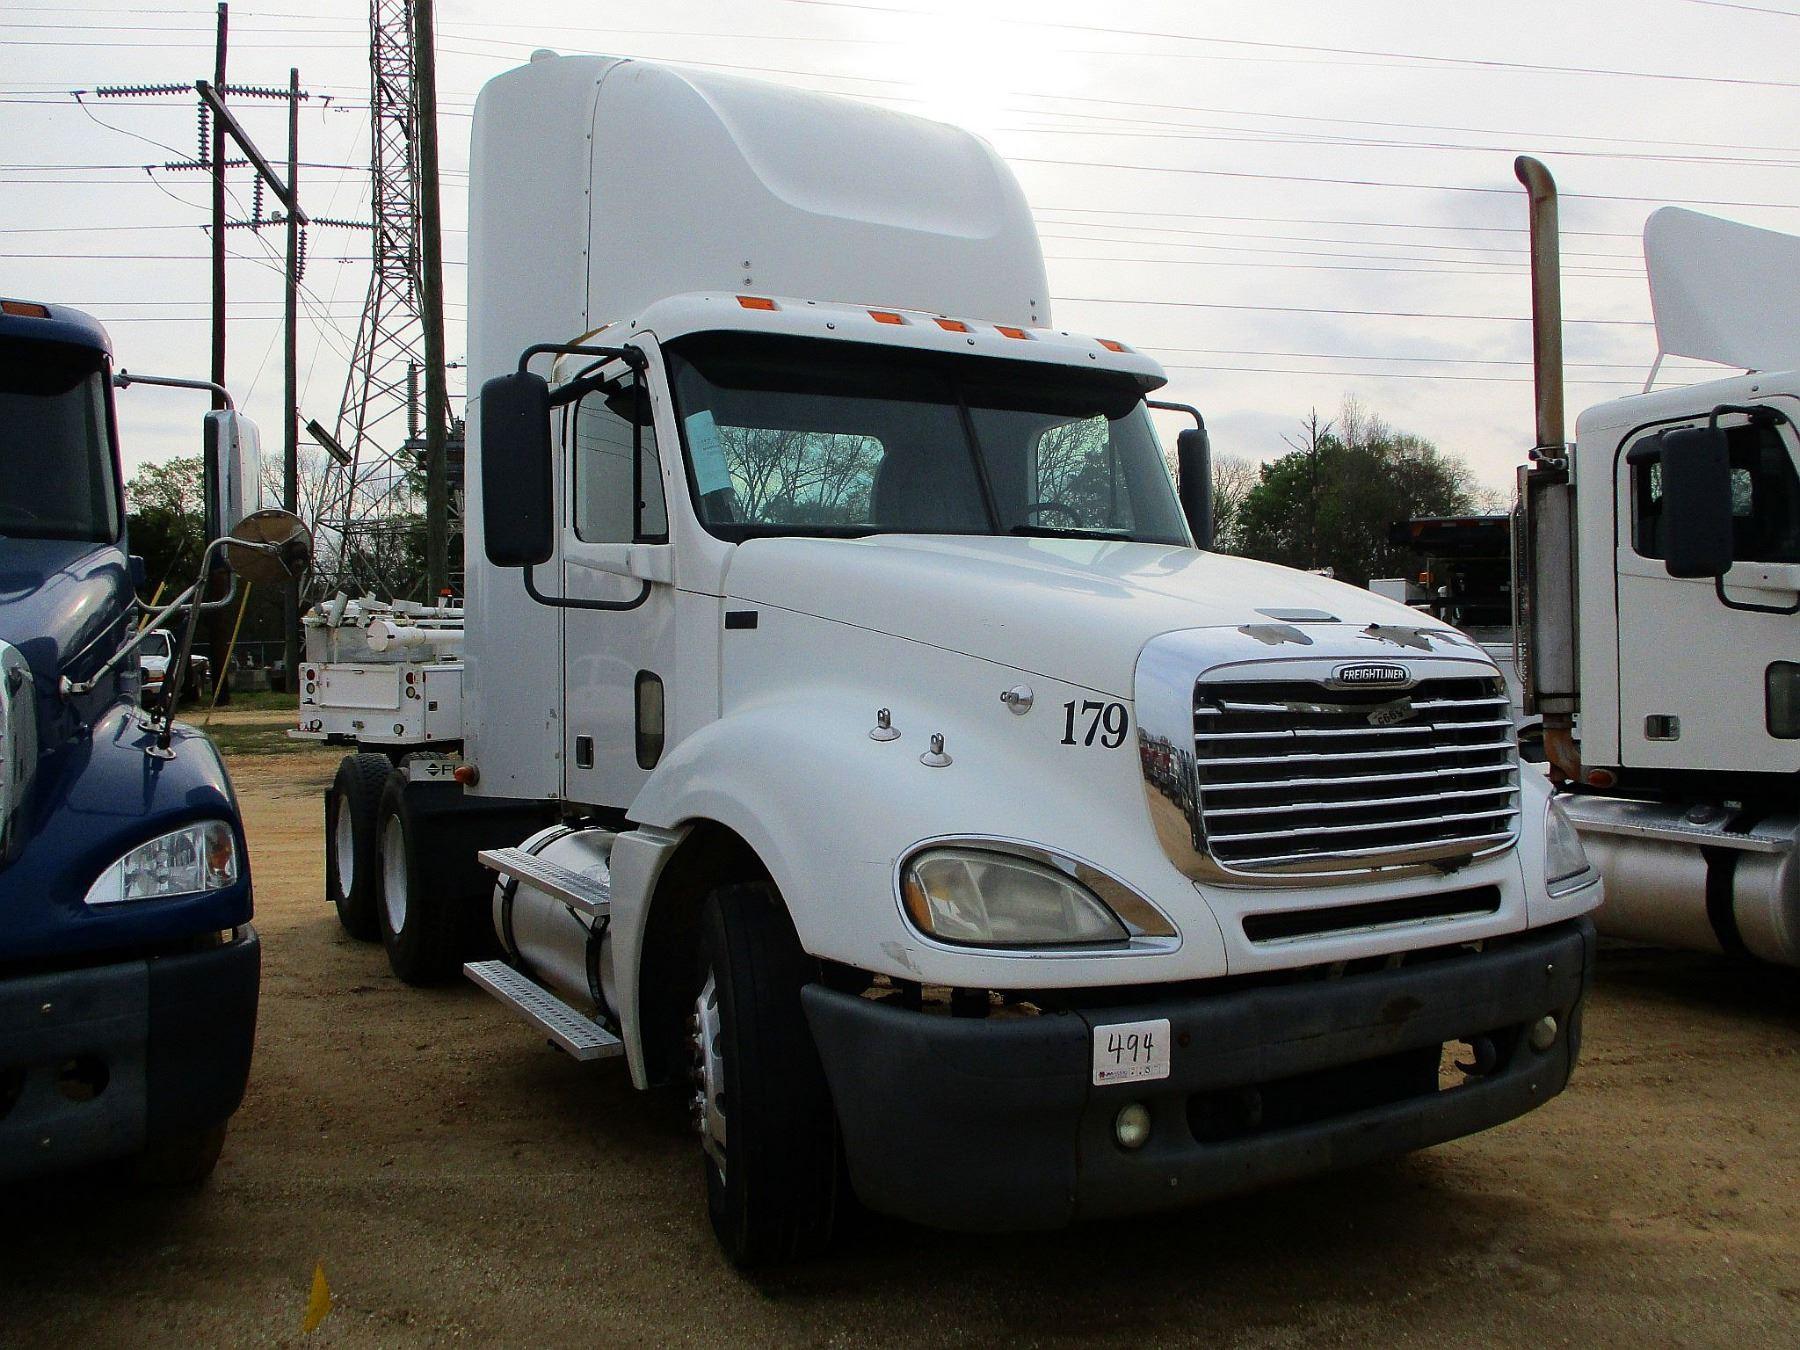 2007 FREIGHTLINER 120 TRUCK TRACTOR, VIN/SN:1FUJAGCK57LY11330 - T/A, S60  DETROIT DIESEL ENGINE, 10 S